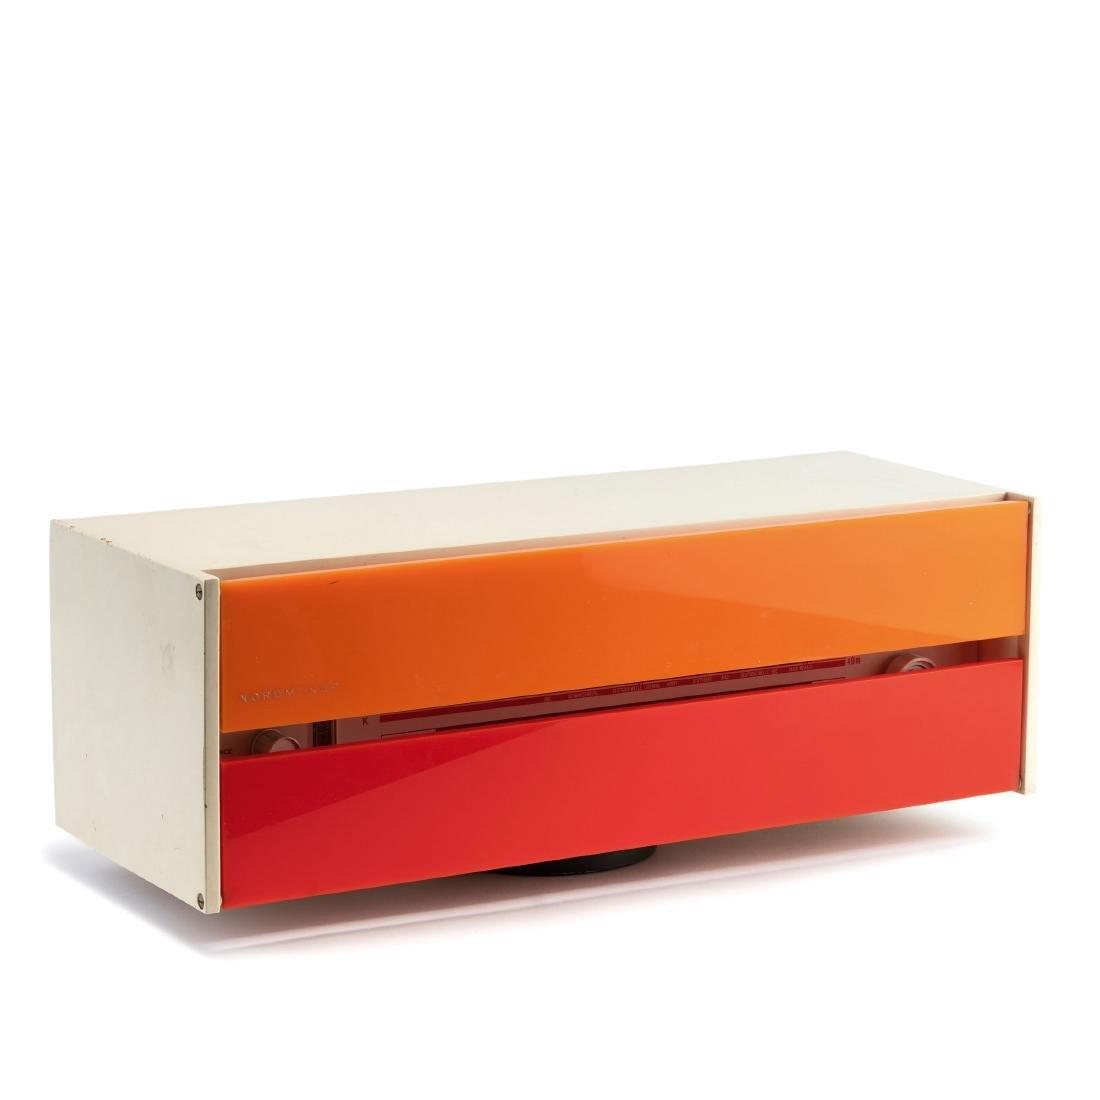 'Spectra Futura' - 'ST 969' radio, 1968/69 - 4